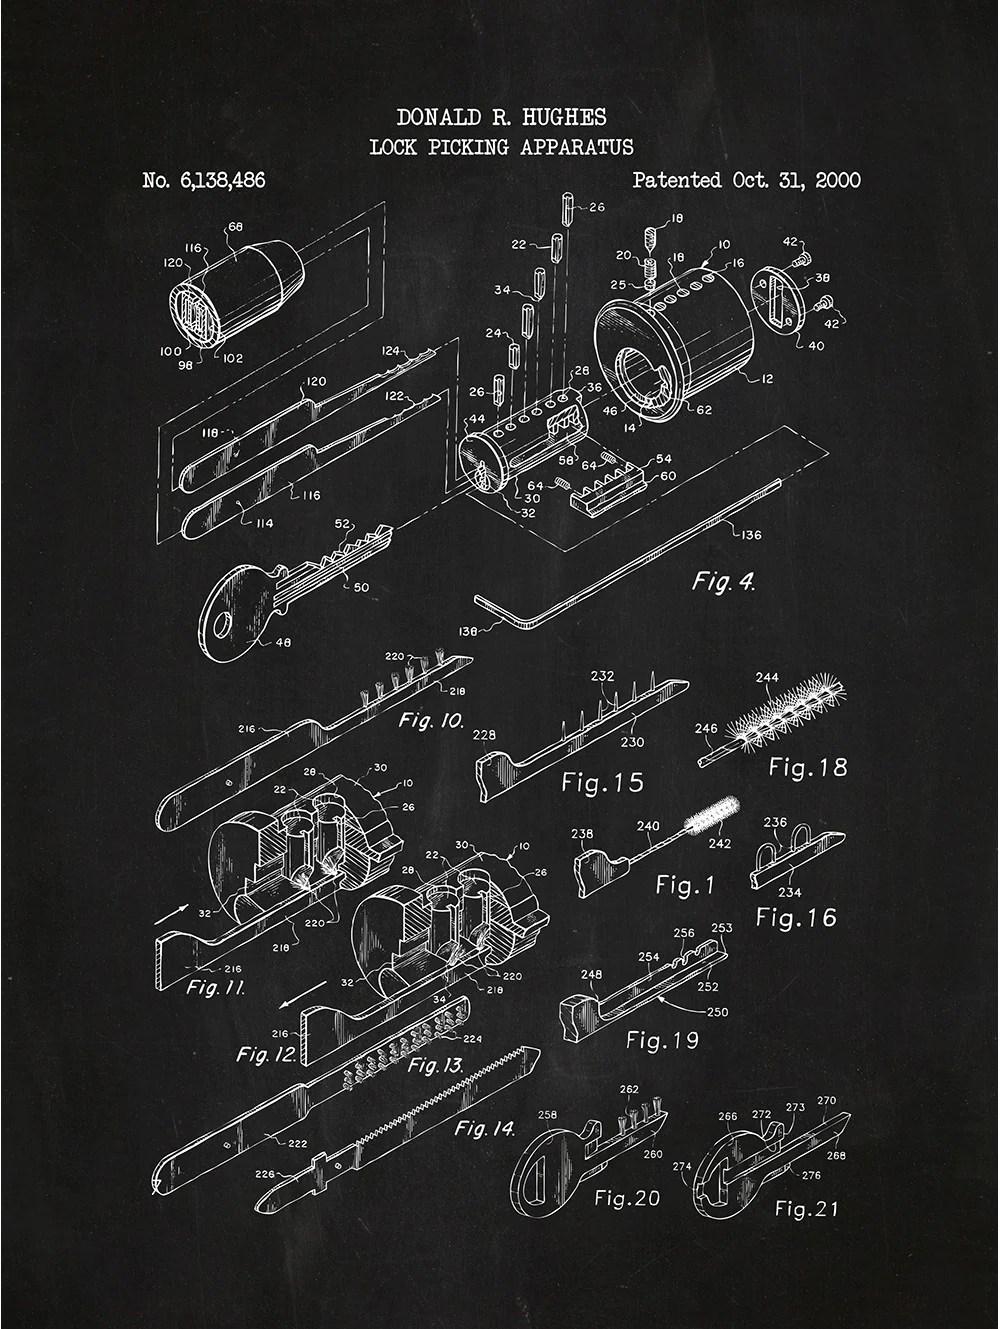 medium resolution of lock picking apparatus donald r hughes 2000